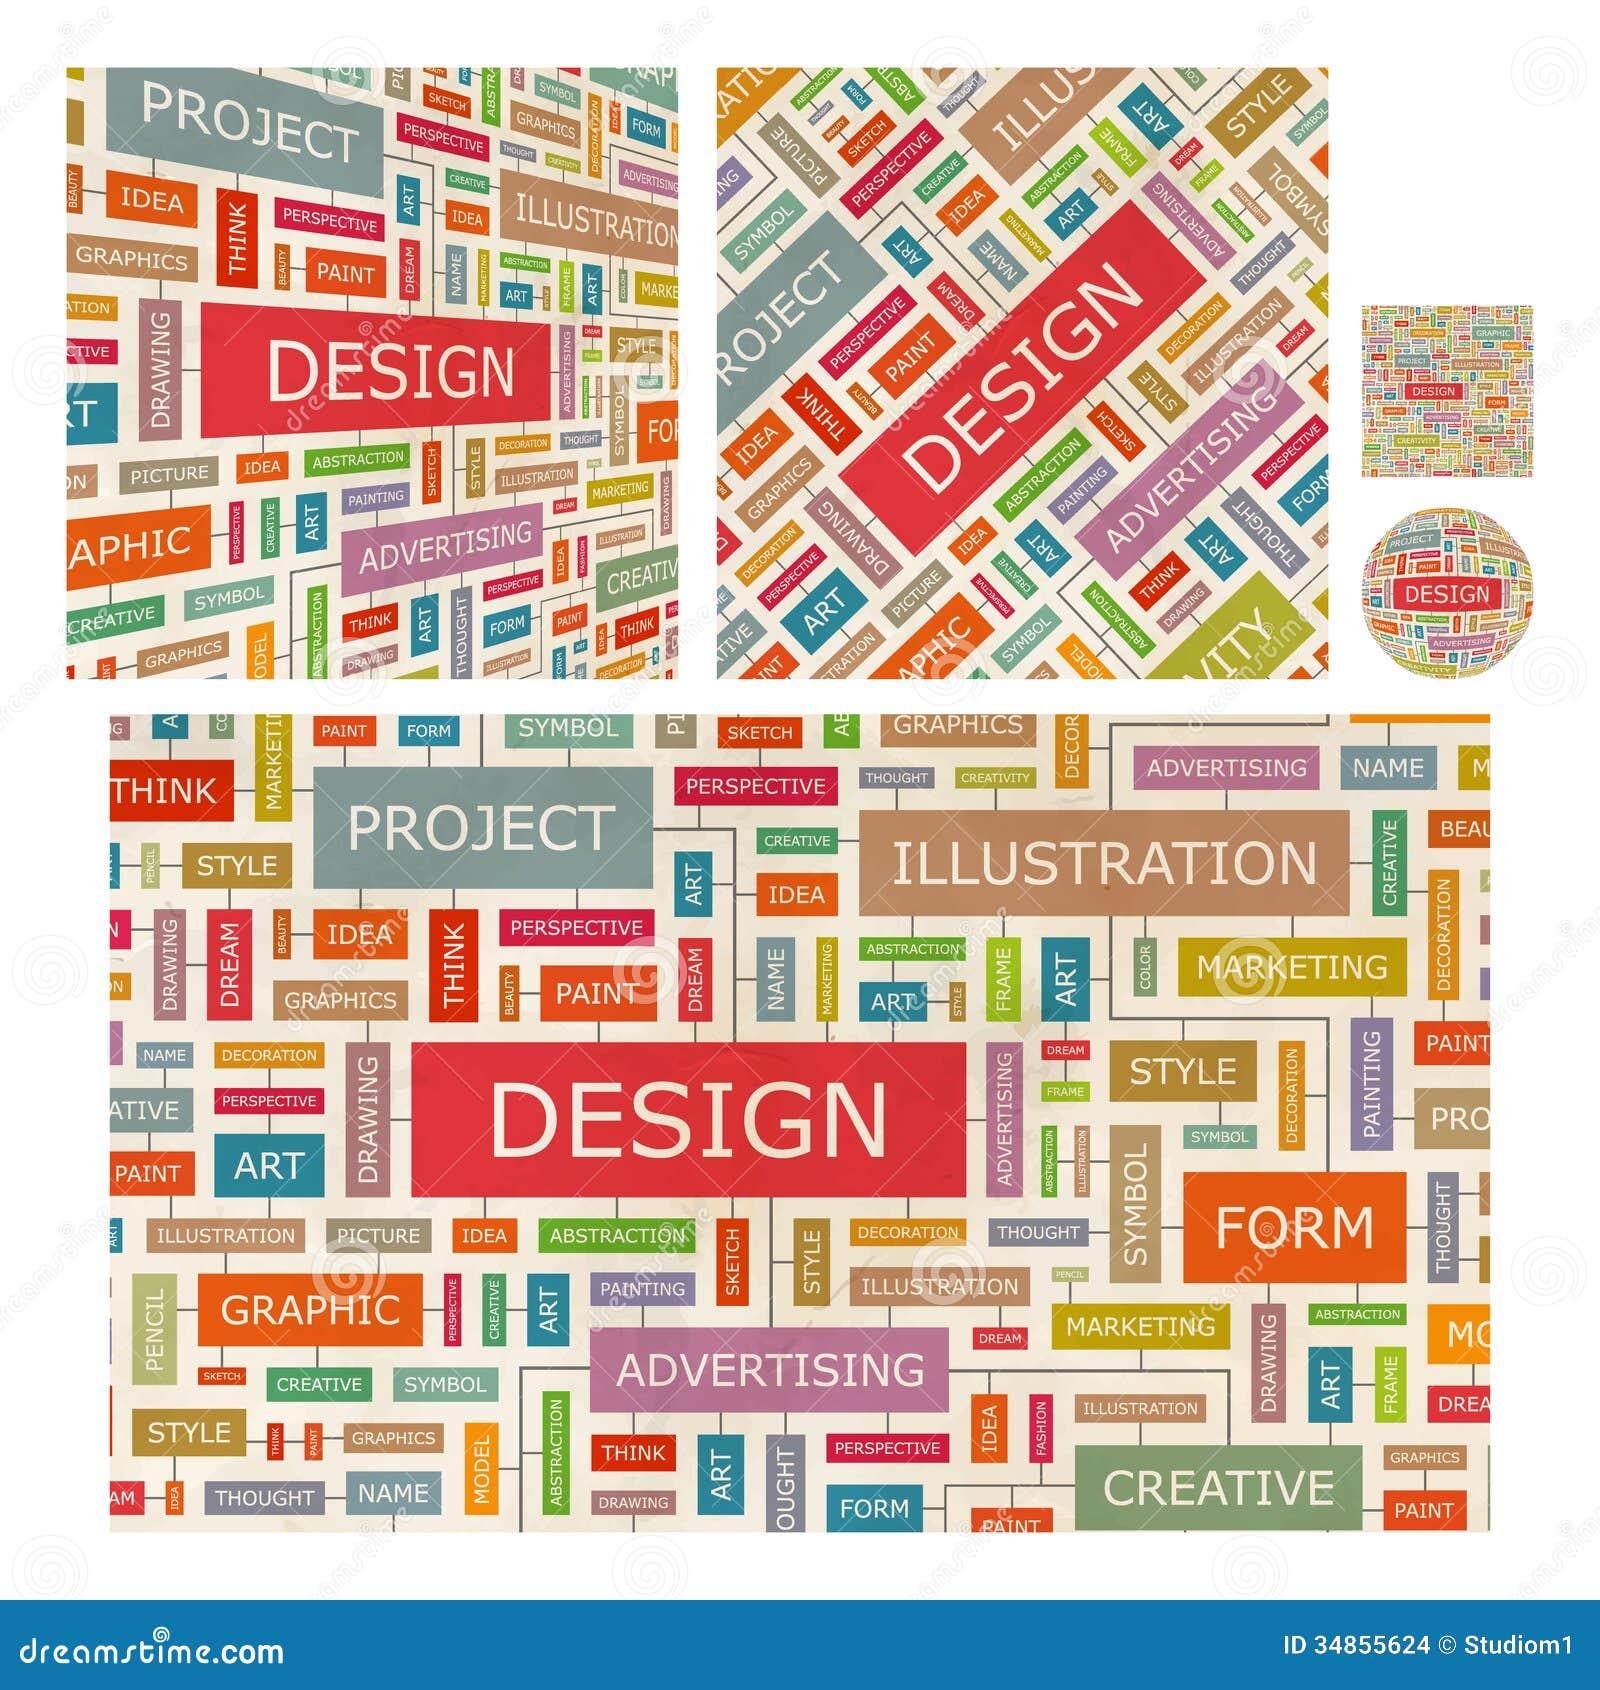 Design word cloud illustration tag cloud concept collage